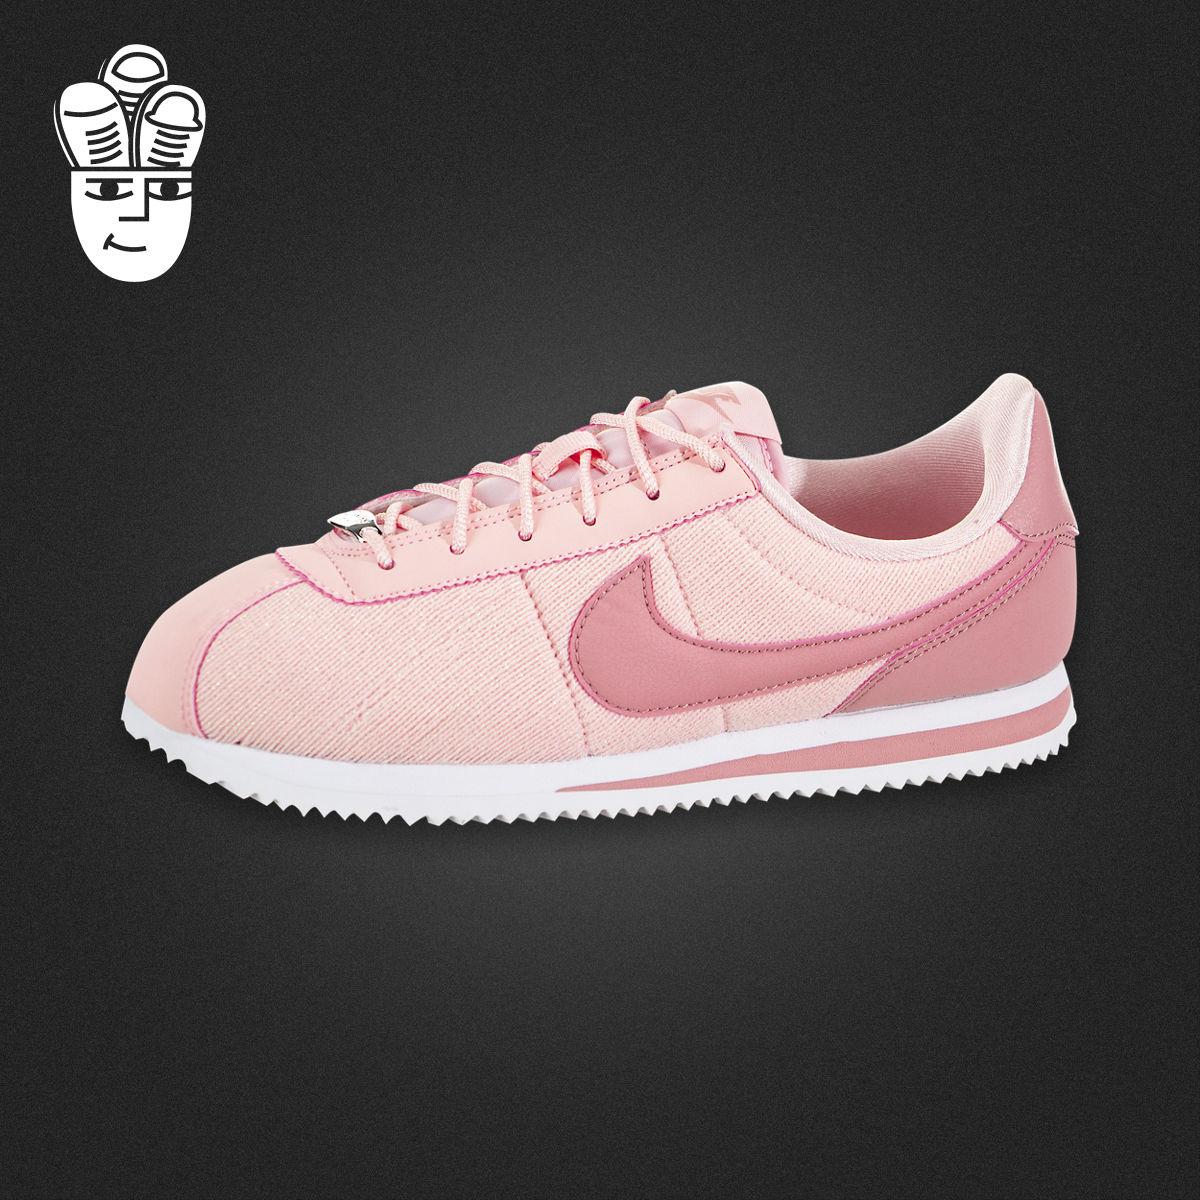 Nike Cortez Basic 耐克男鞋女鞋GS 复古运动休闲鞋 阿甘鞋